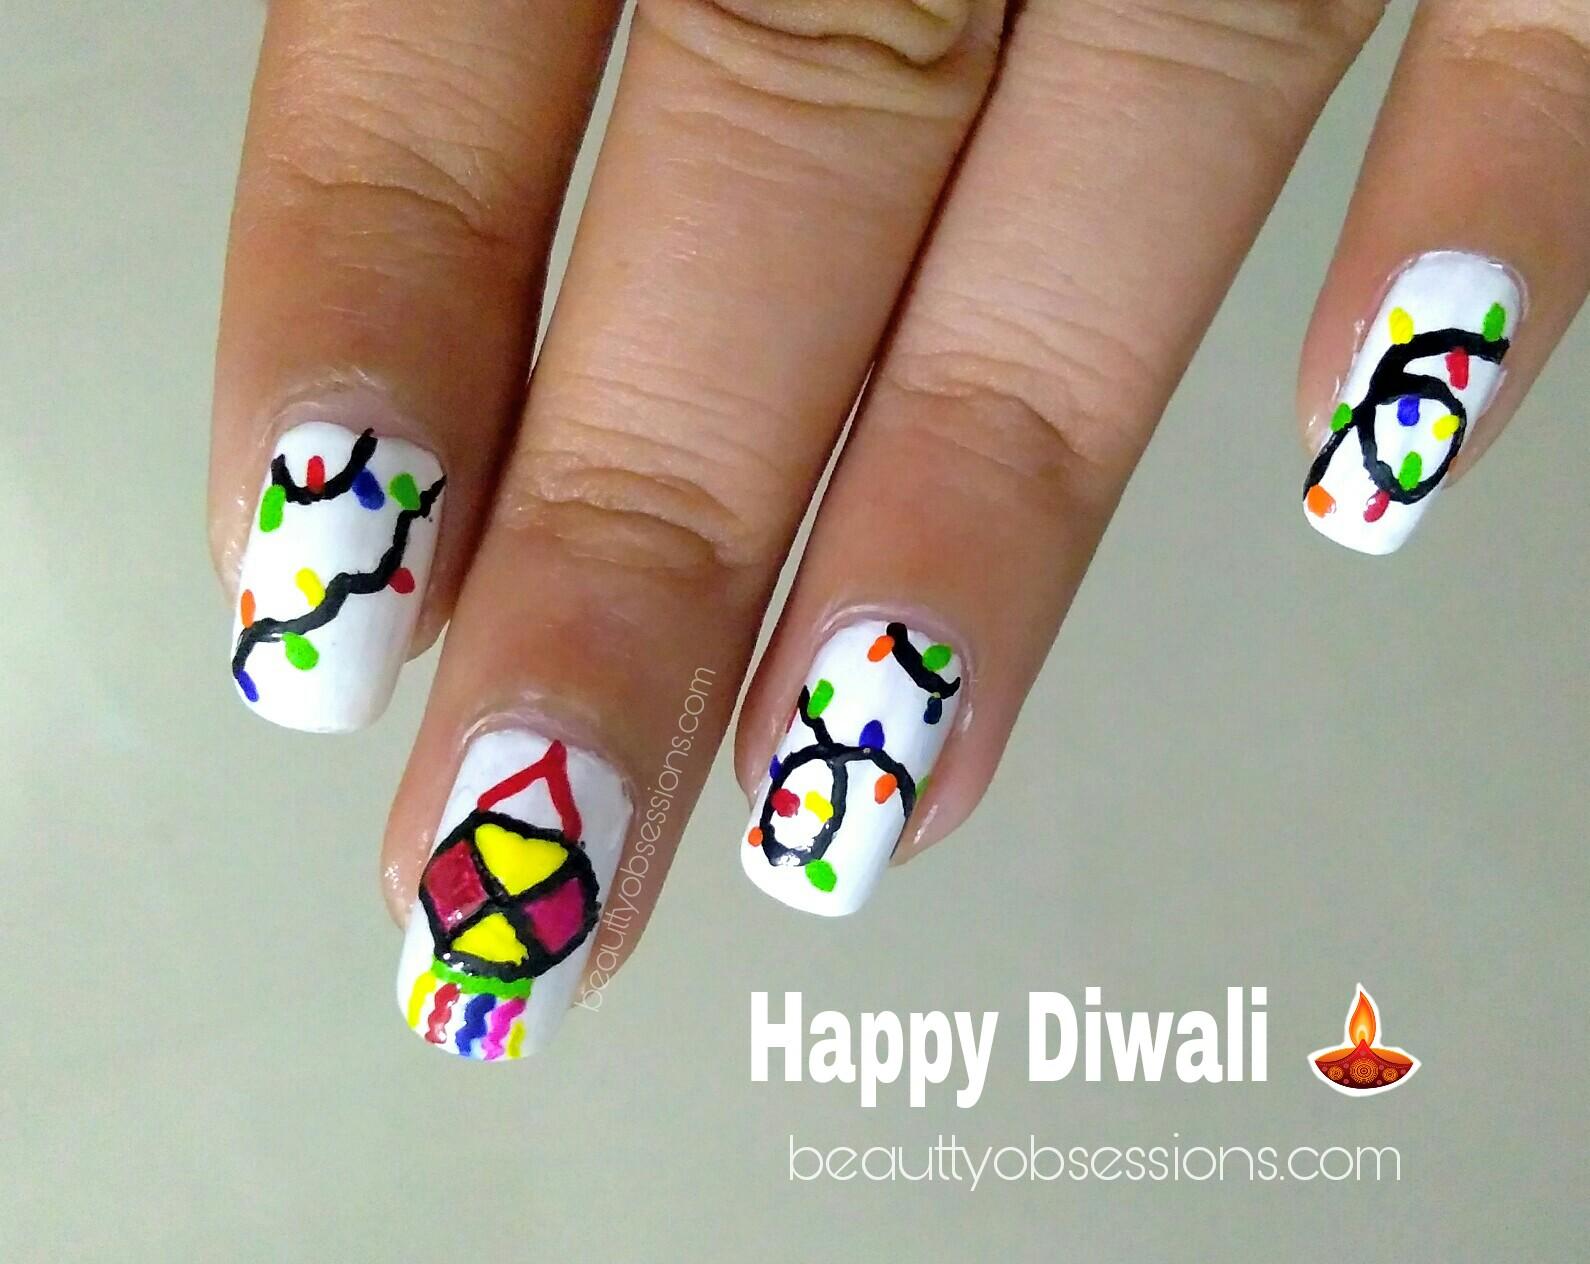 Nailart Inspired By Diwali Light Decoration Diwali Nailart 1